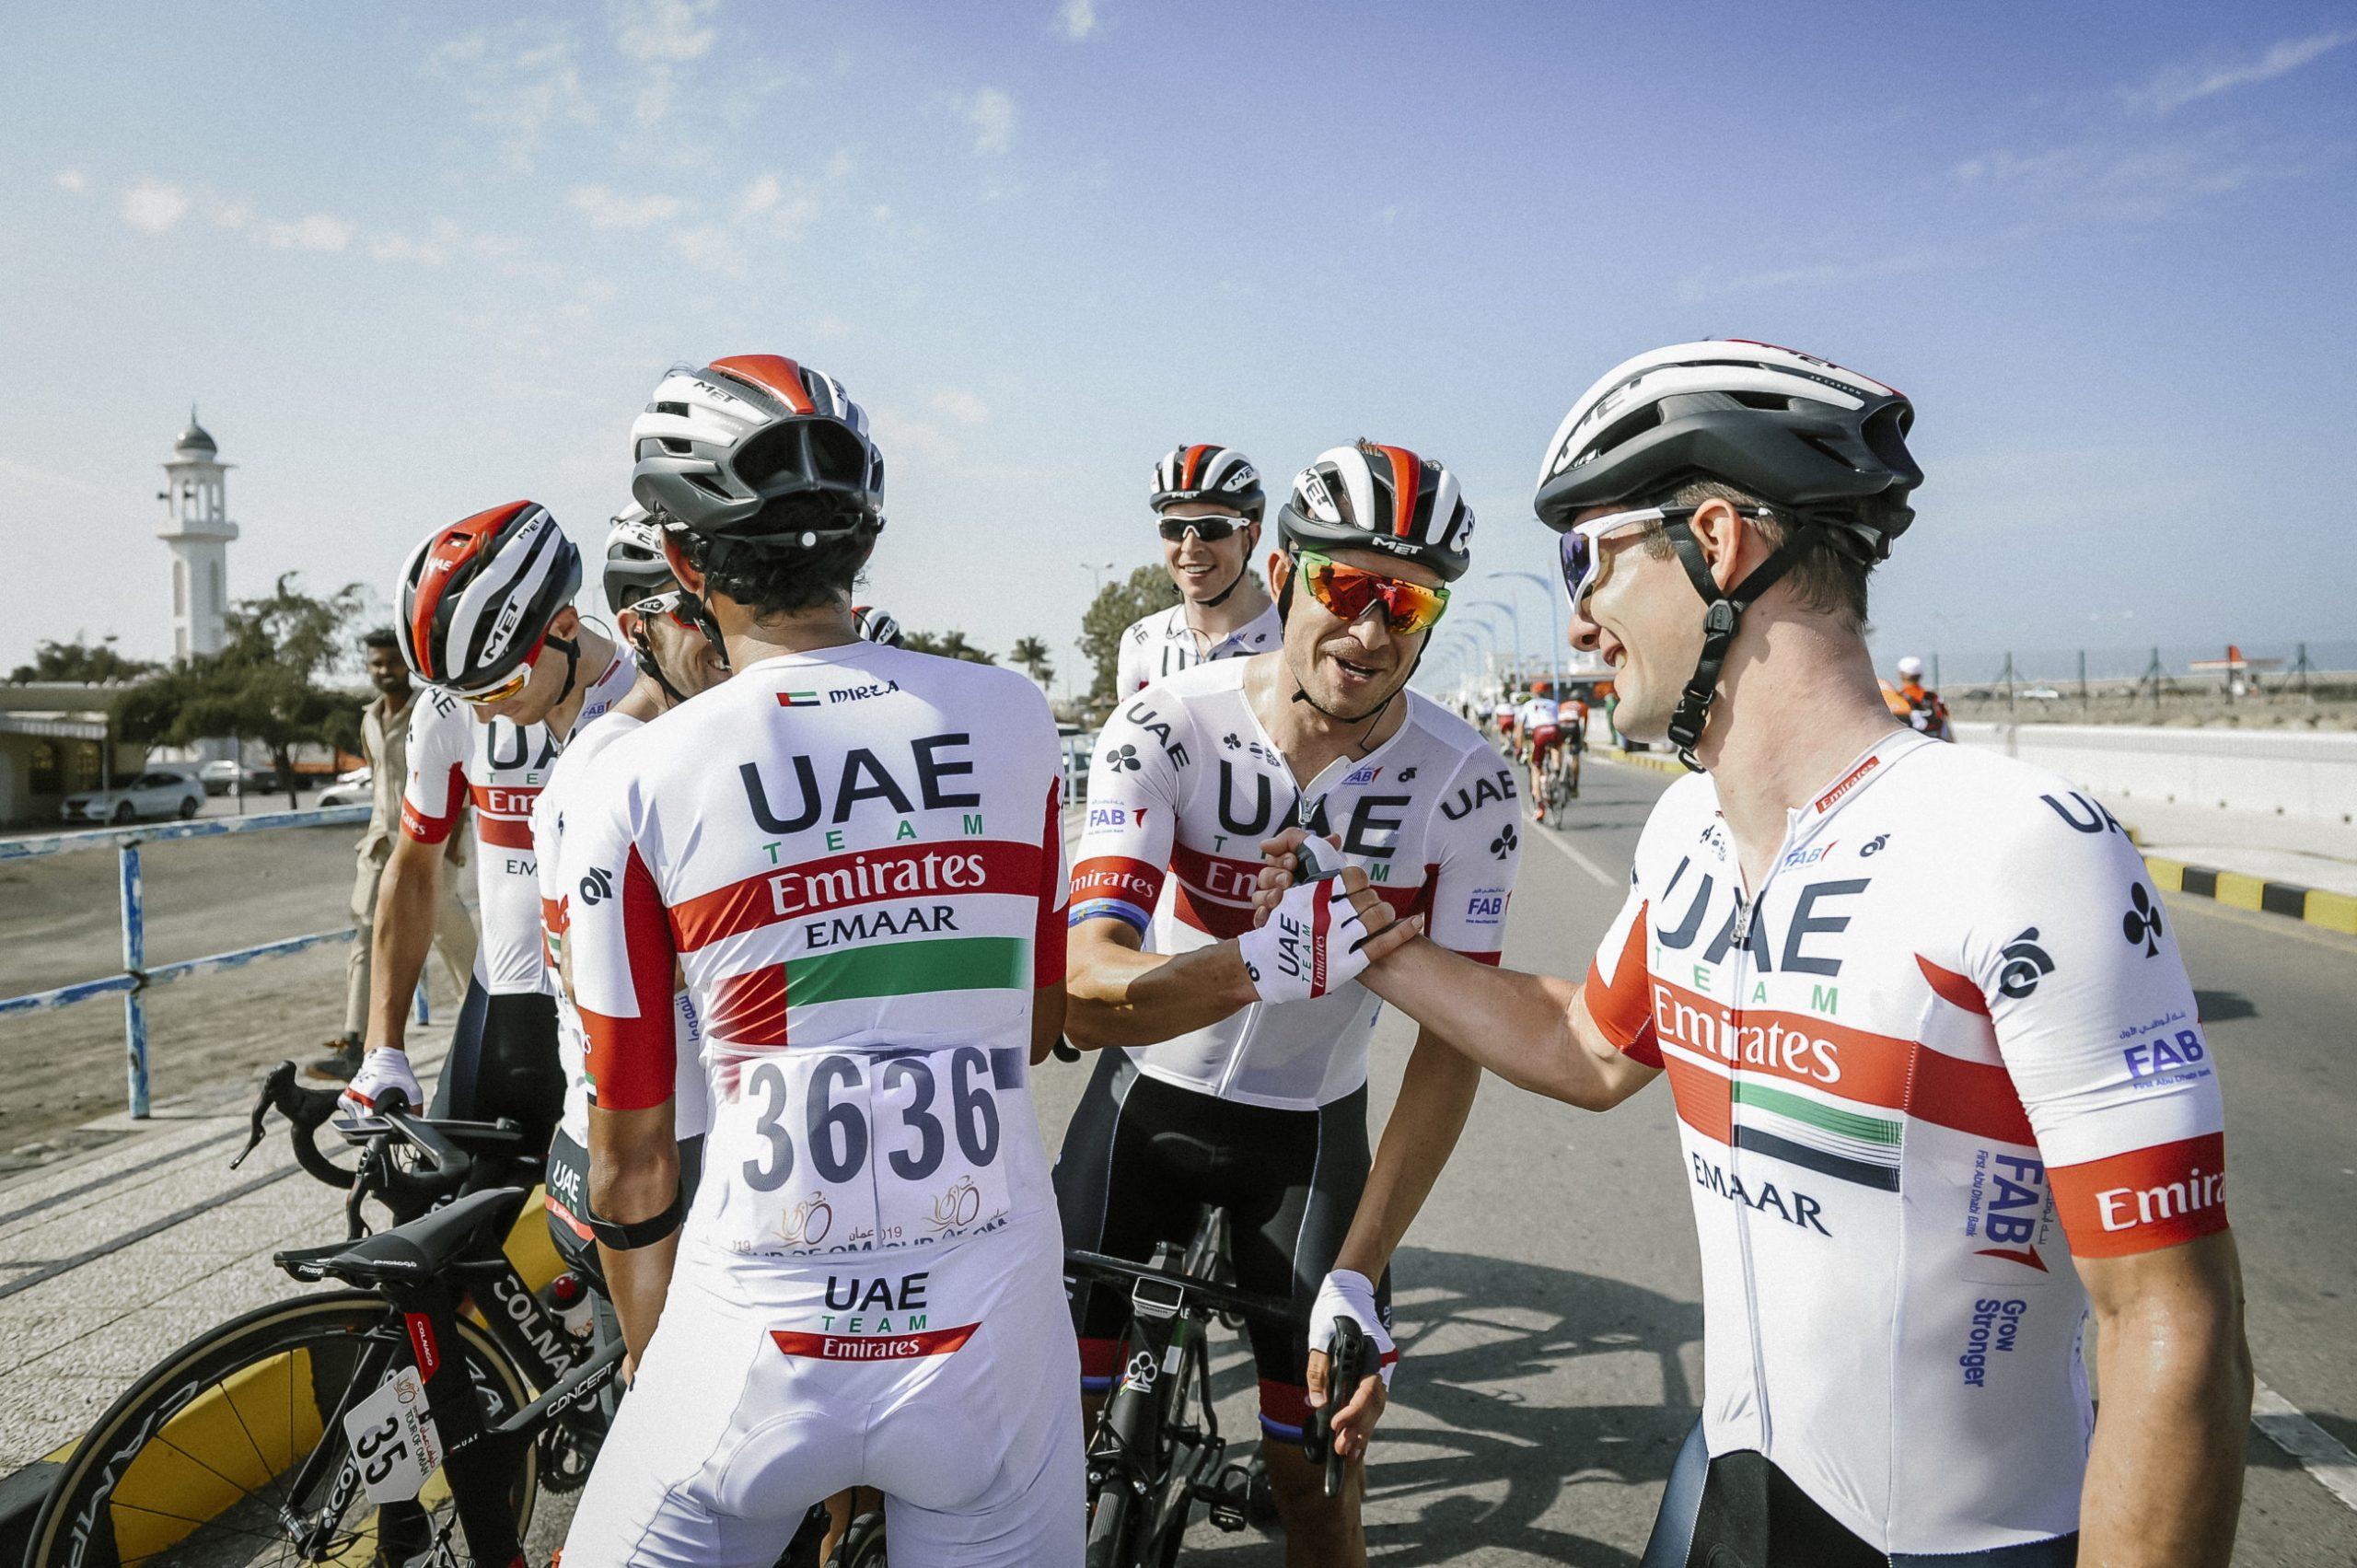 Nordmenn bekreftet klar for Tour de France